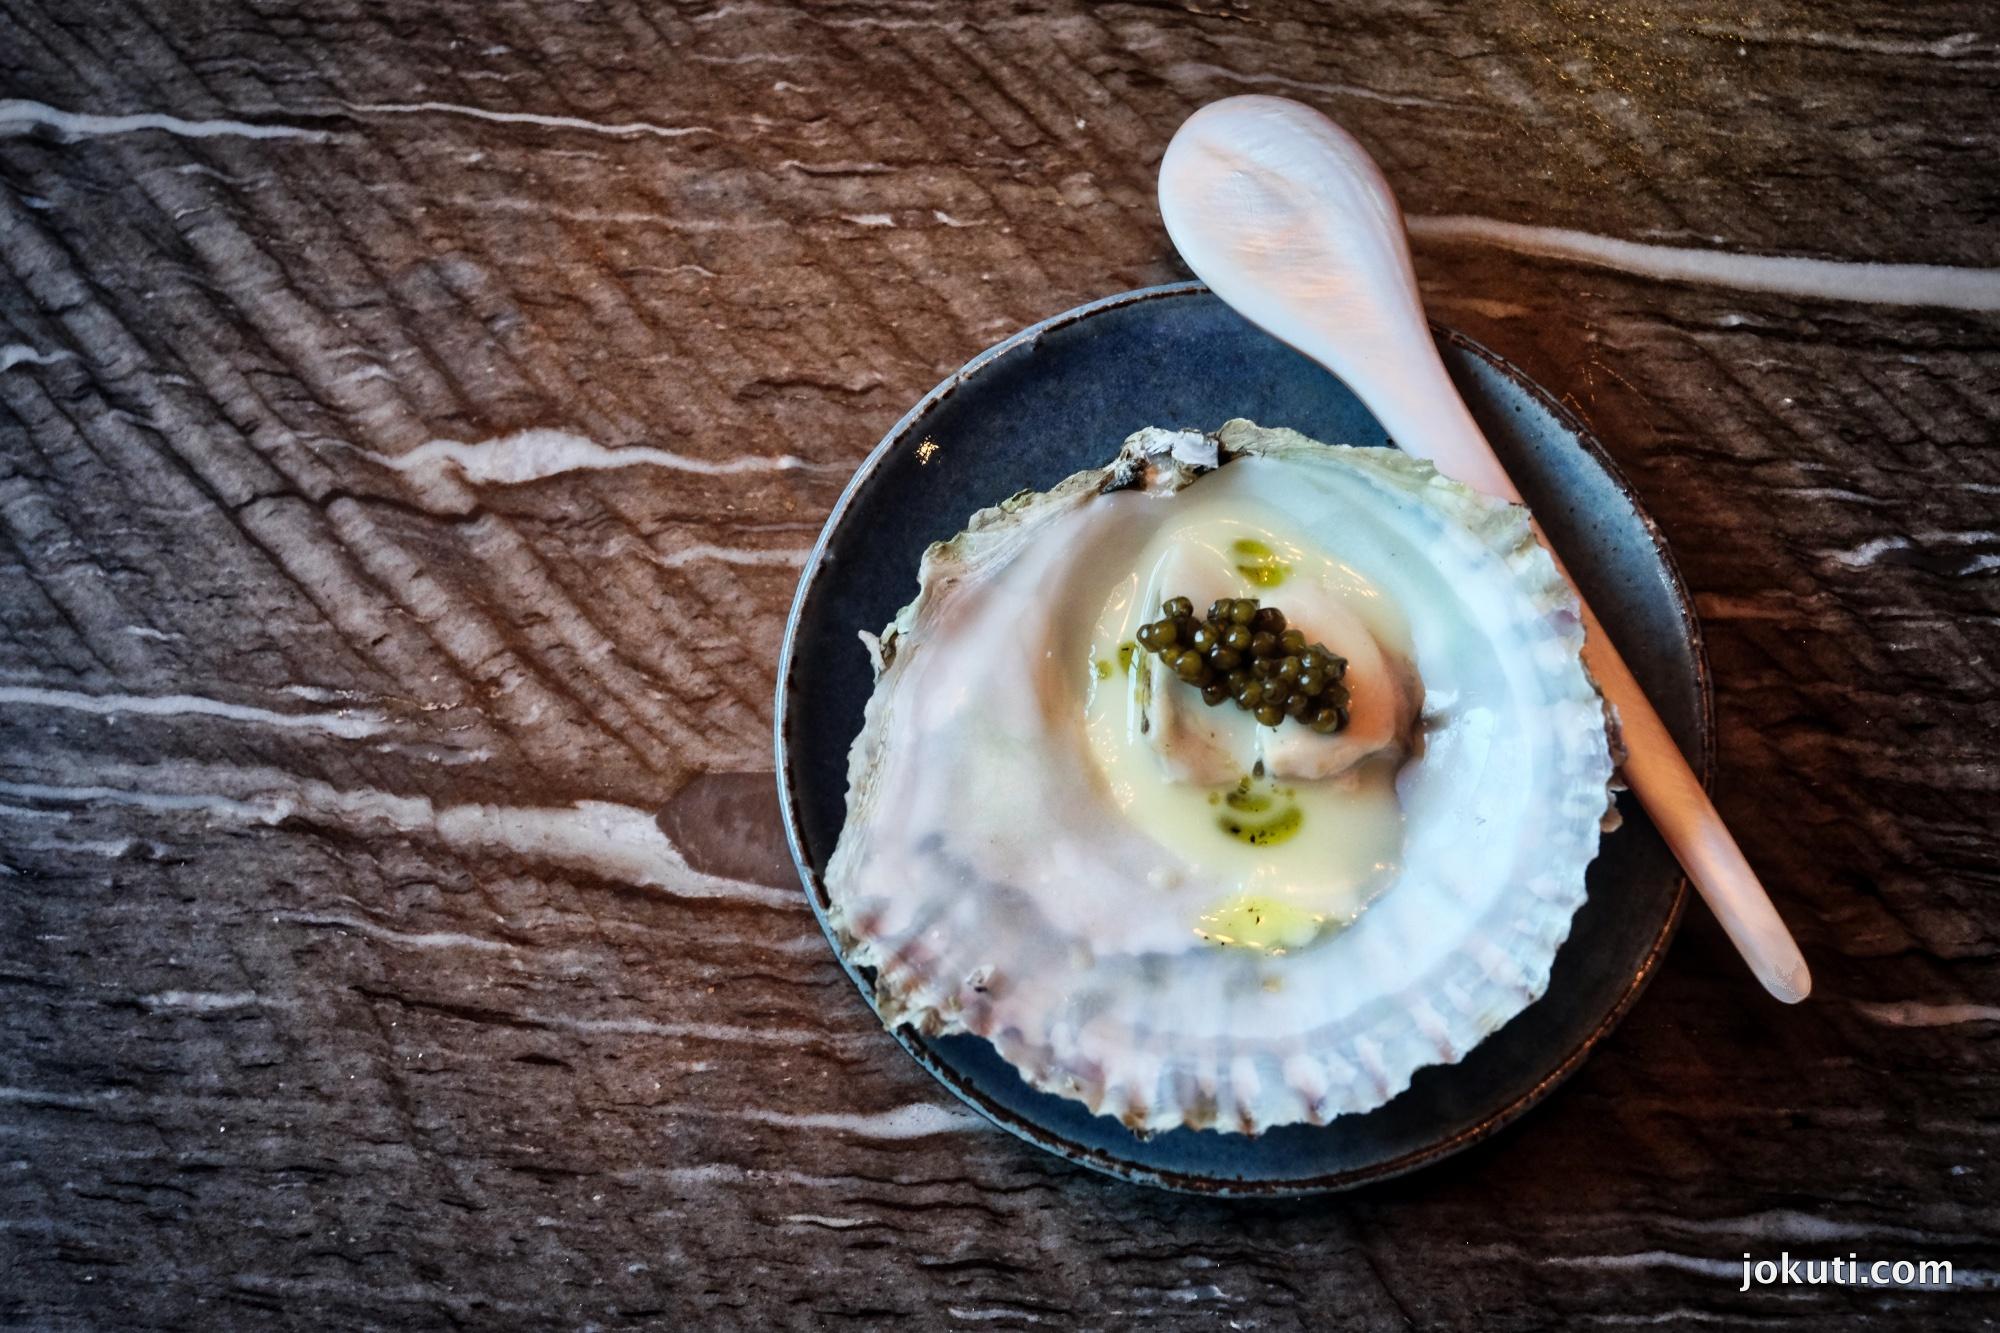 dscf5437_frantzen_stockholm_restaurant_michelin_stars_sweden_vilagevo_jokuti_l.jpg